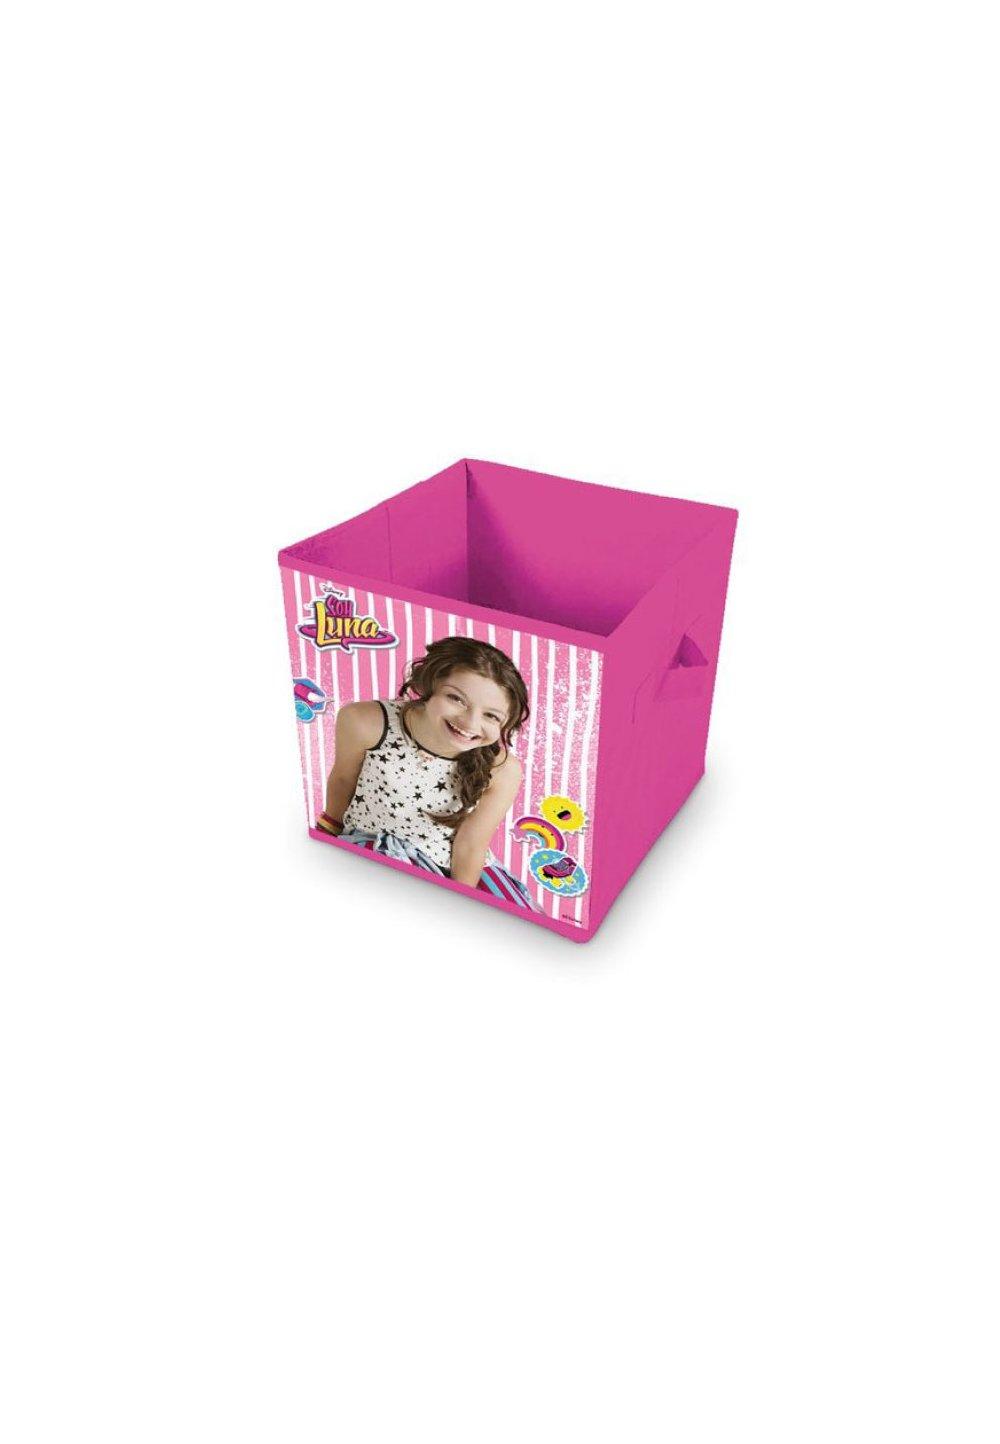 Cutie depozitare, pliabila, Soy Luna, roz imagine